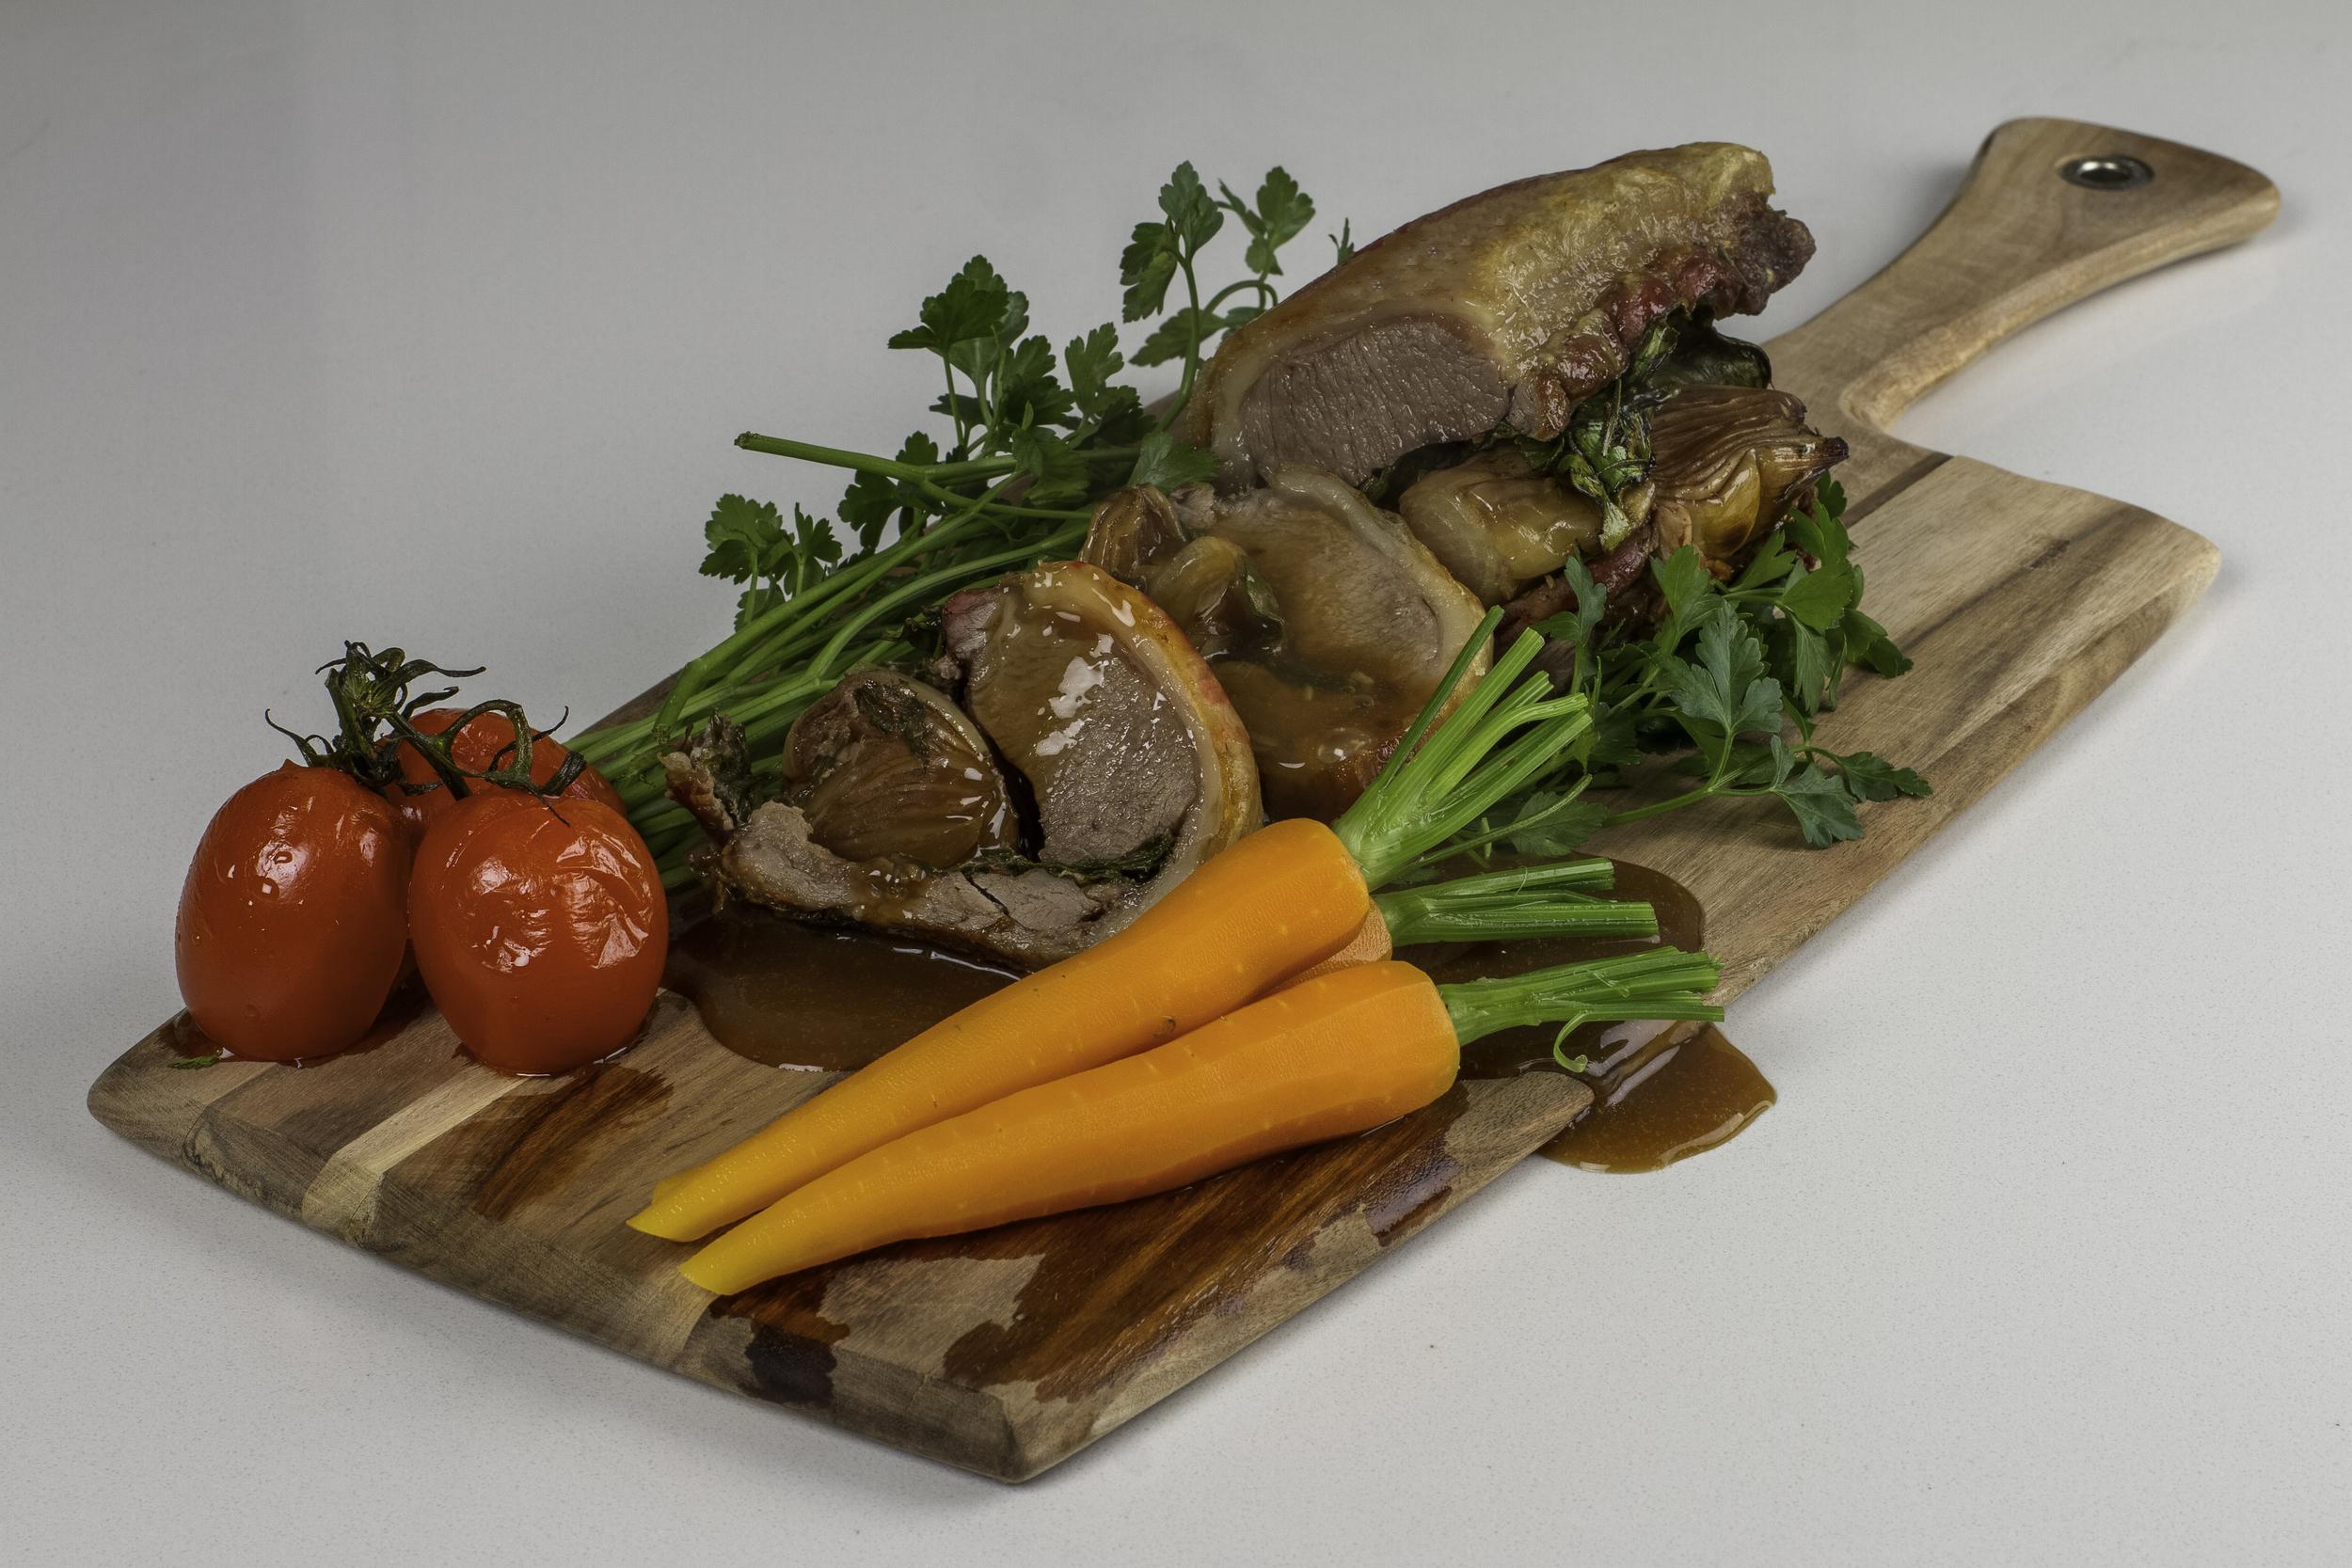 Roast with Gravy. ISO 100, Shutter 1/160, Aperture f/11